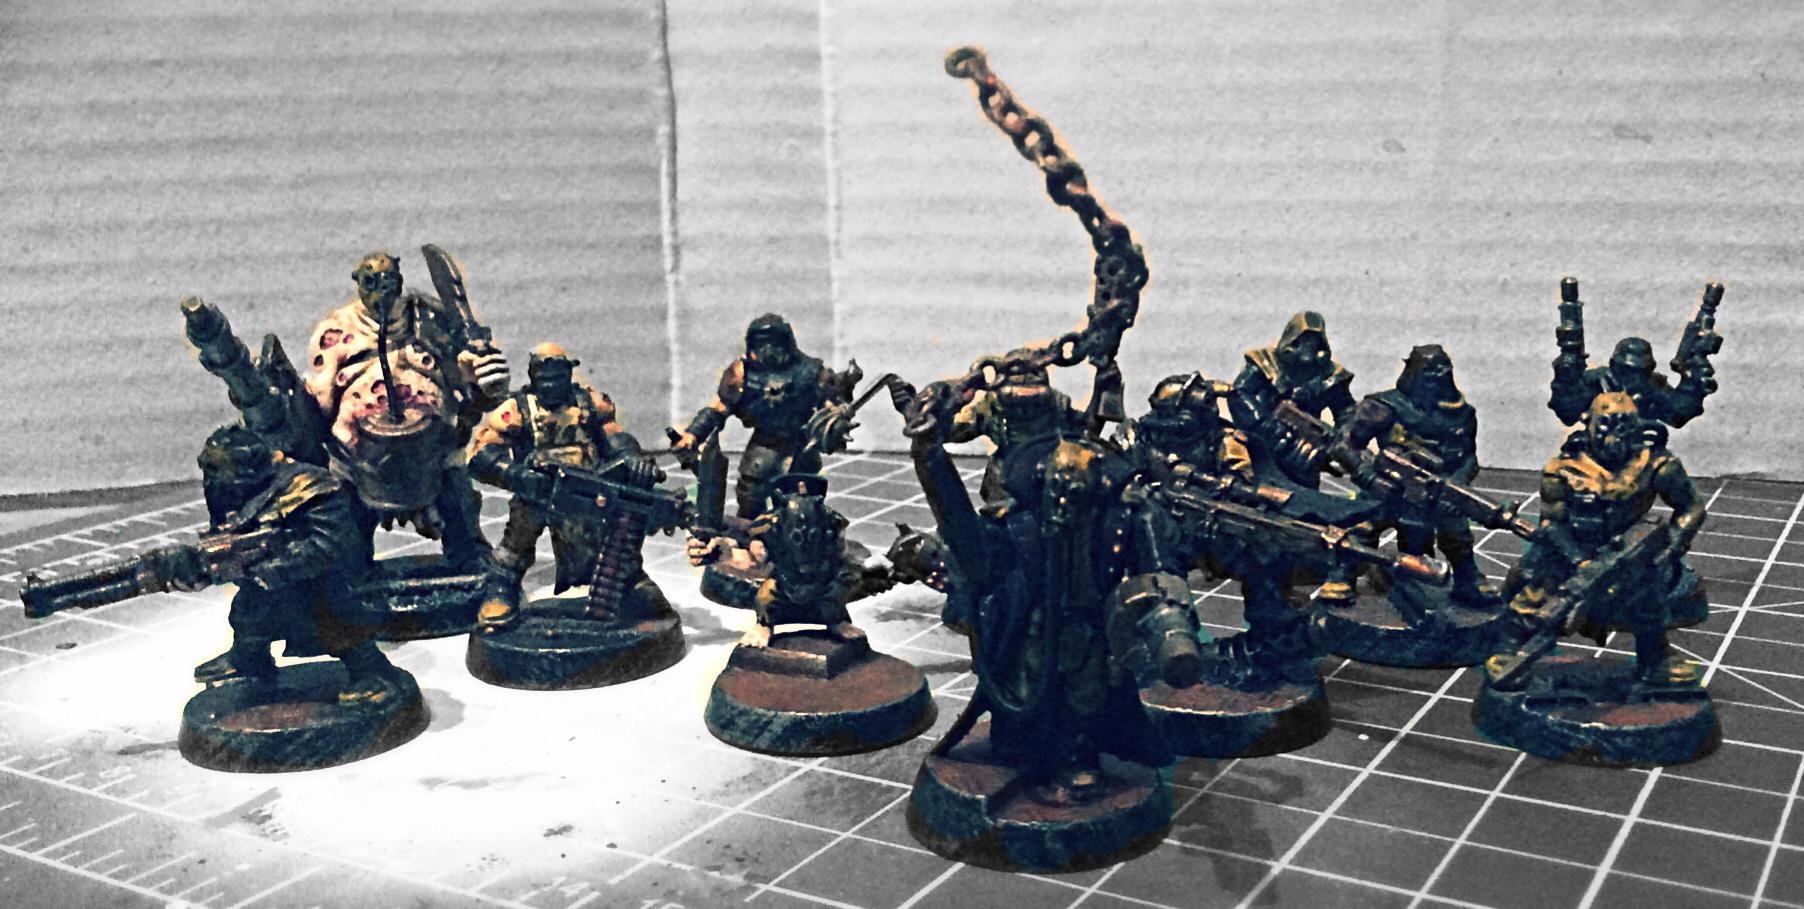 Chaos, Cultists, Ganger, Grimdark, Necromunda, Orlock, Warhammer 40,000